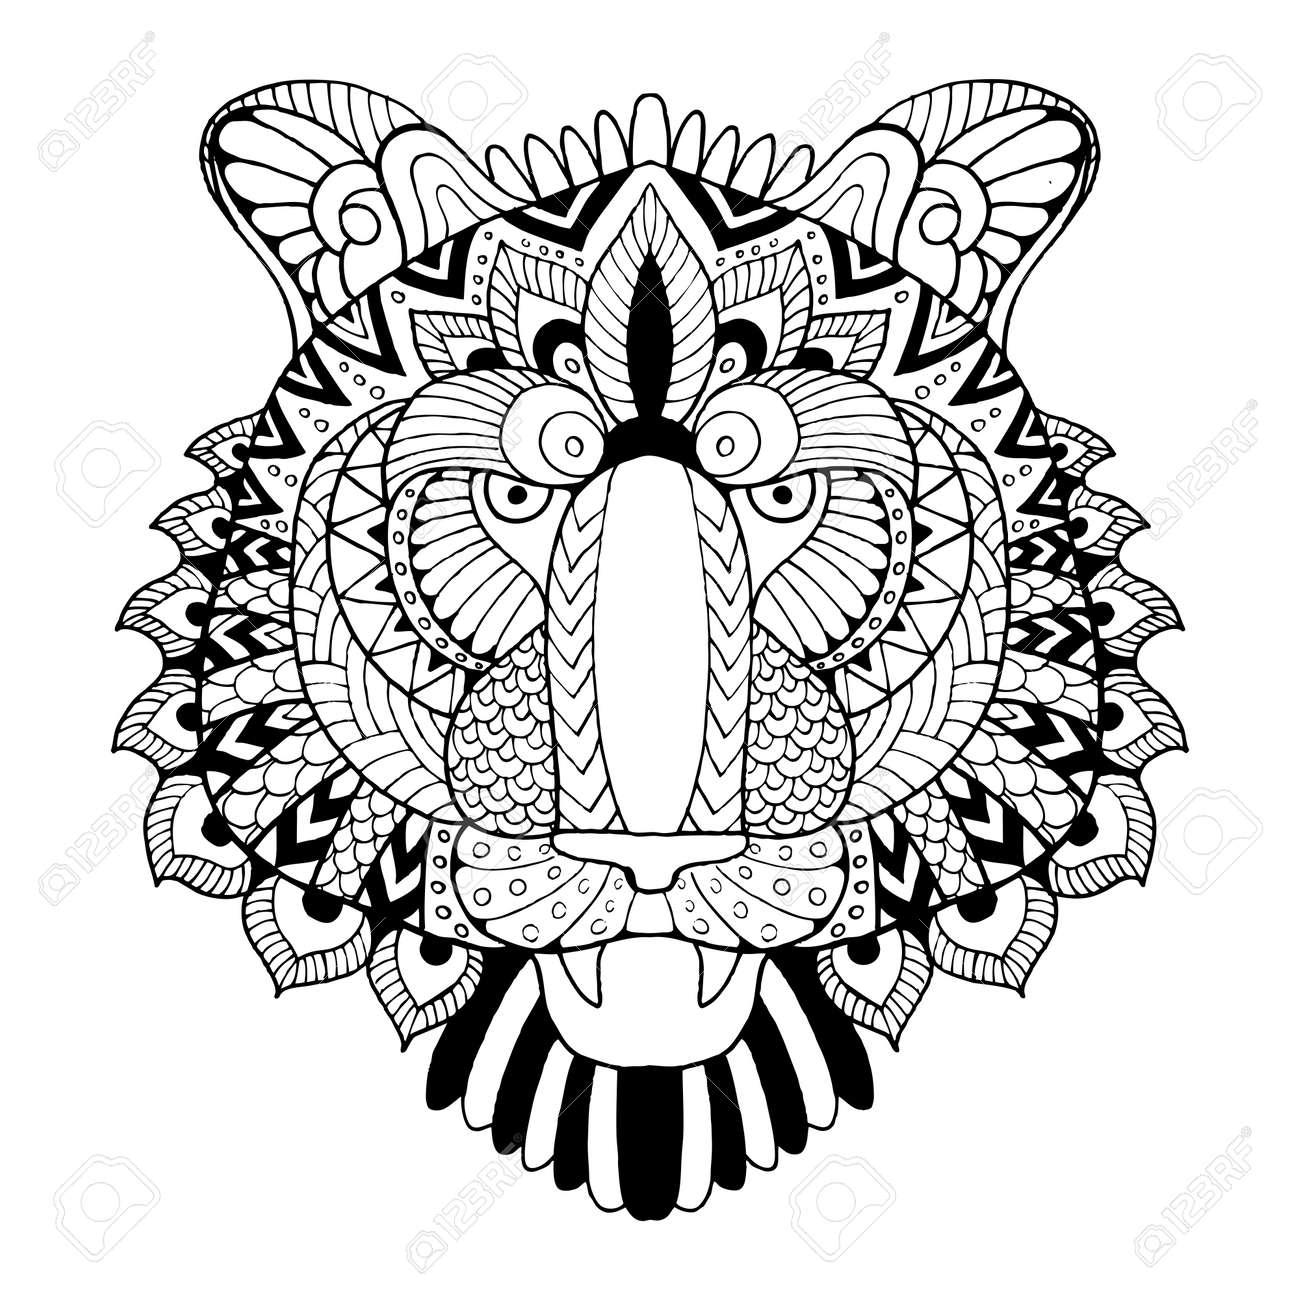 tiger coloring book vector illustration royalty free cliparts